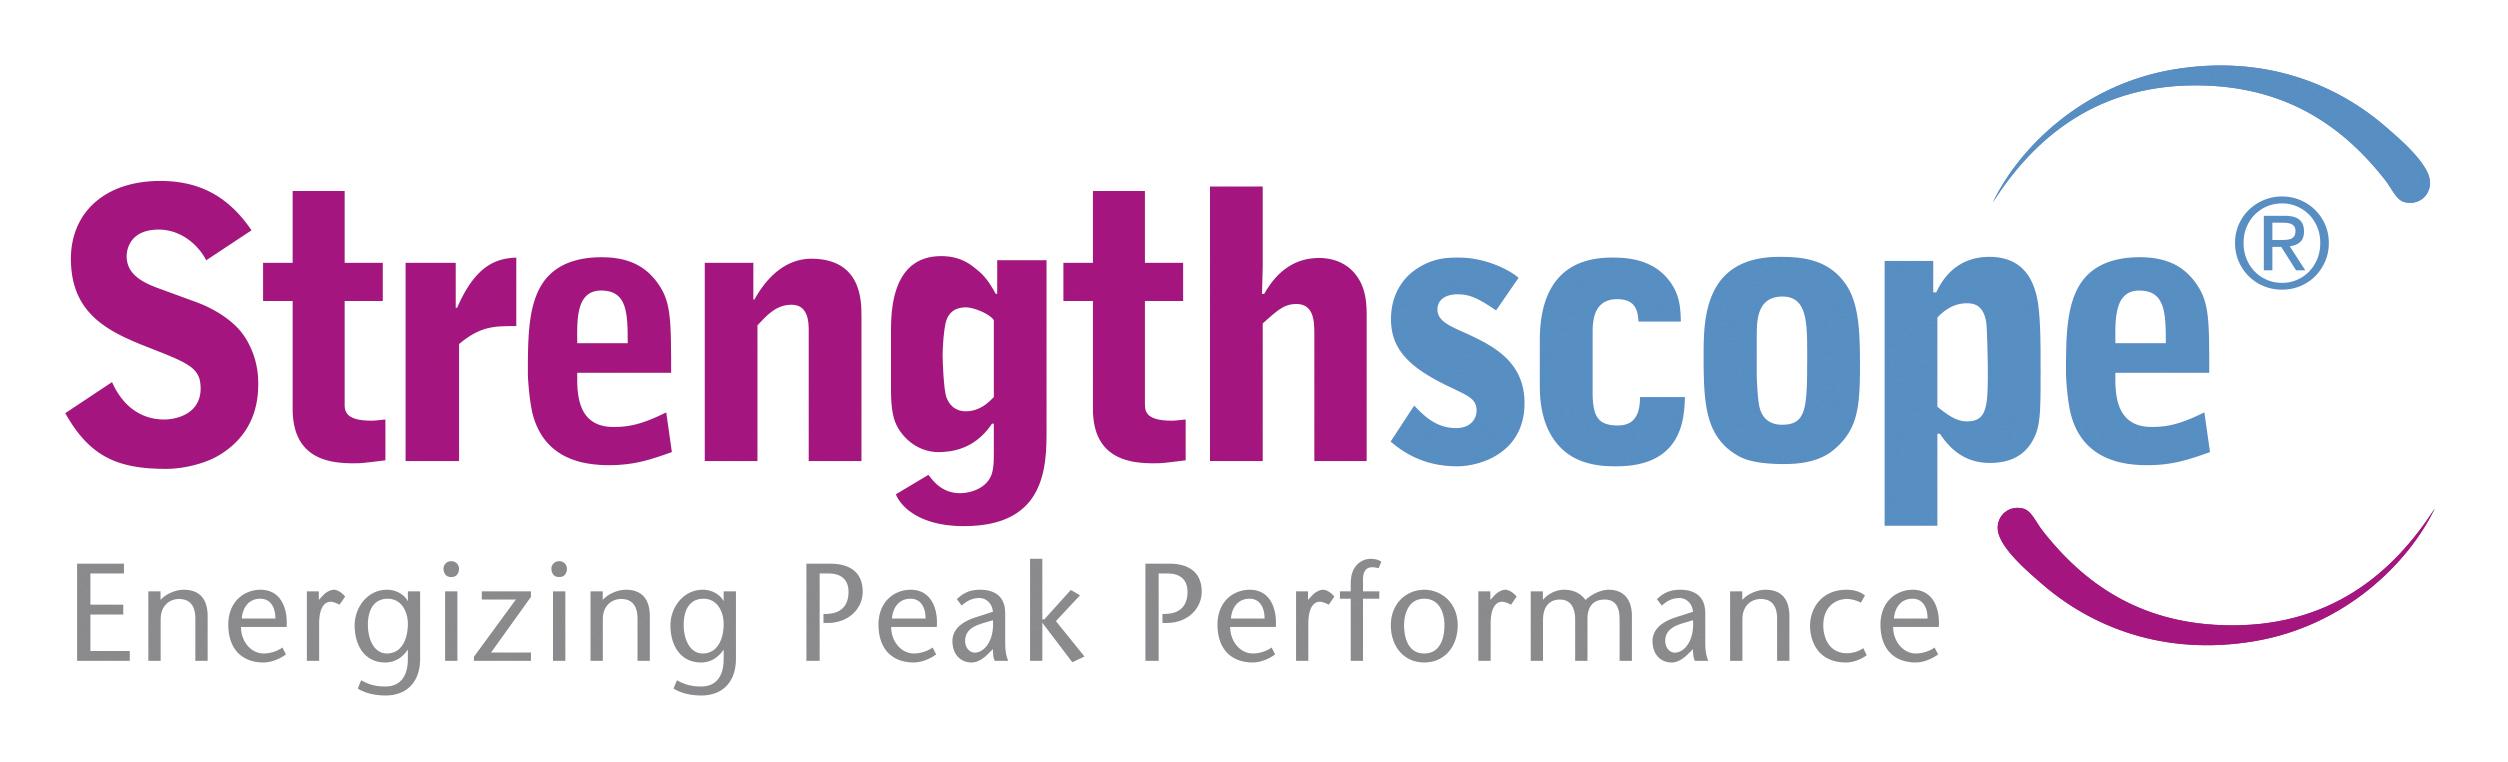 Strengthscope logo